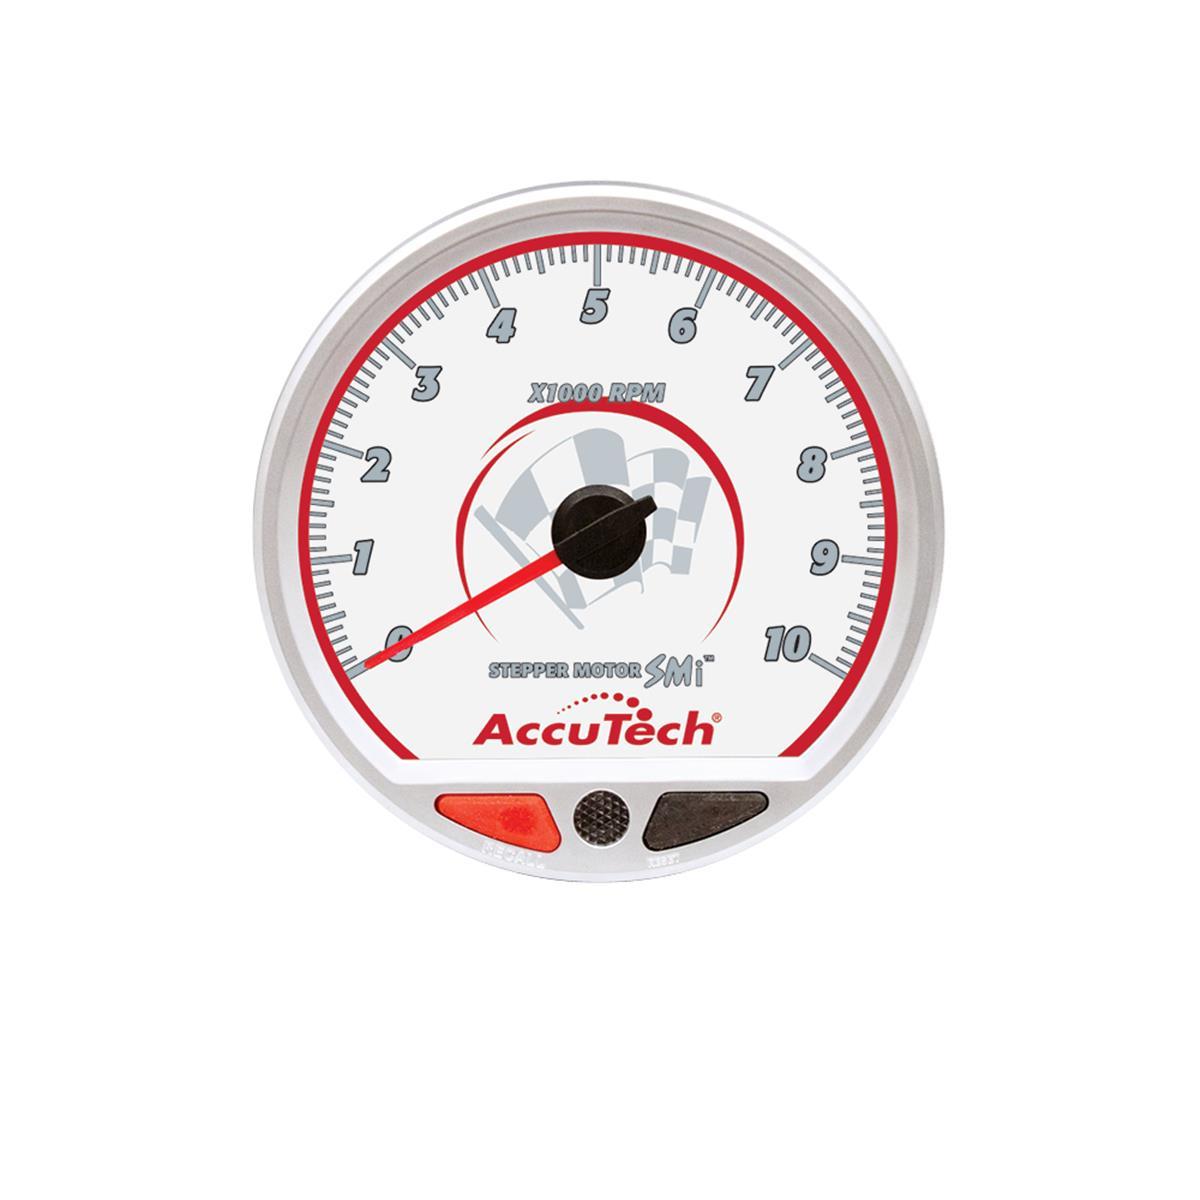 hight resolution of accutech smi stepper motor memory tachometer silver